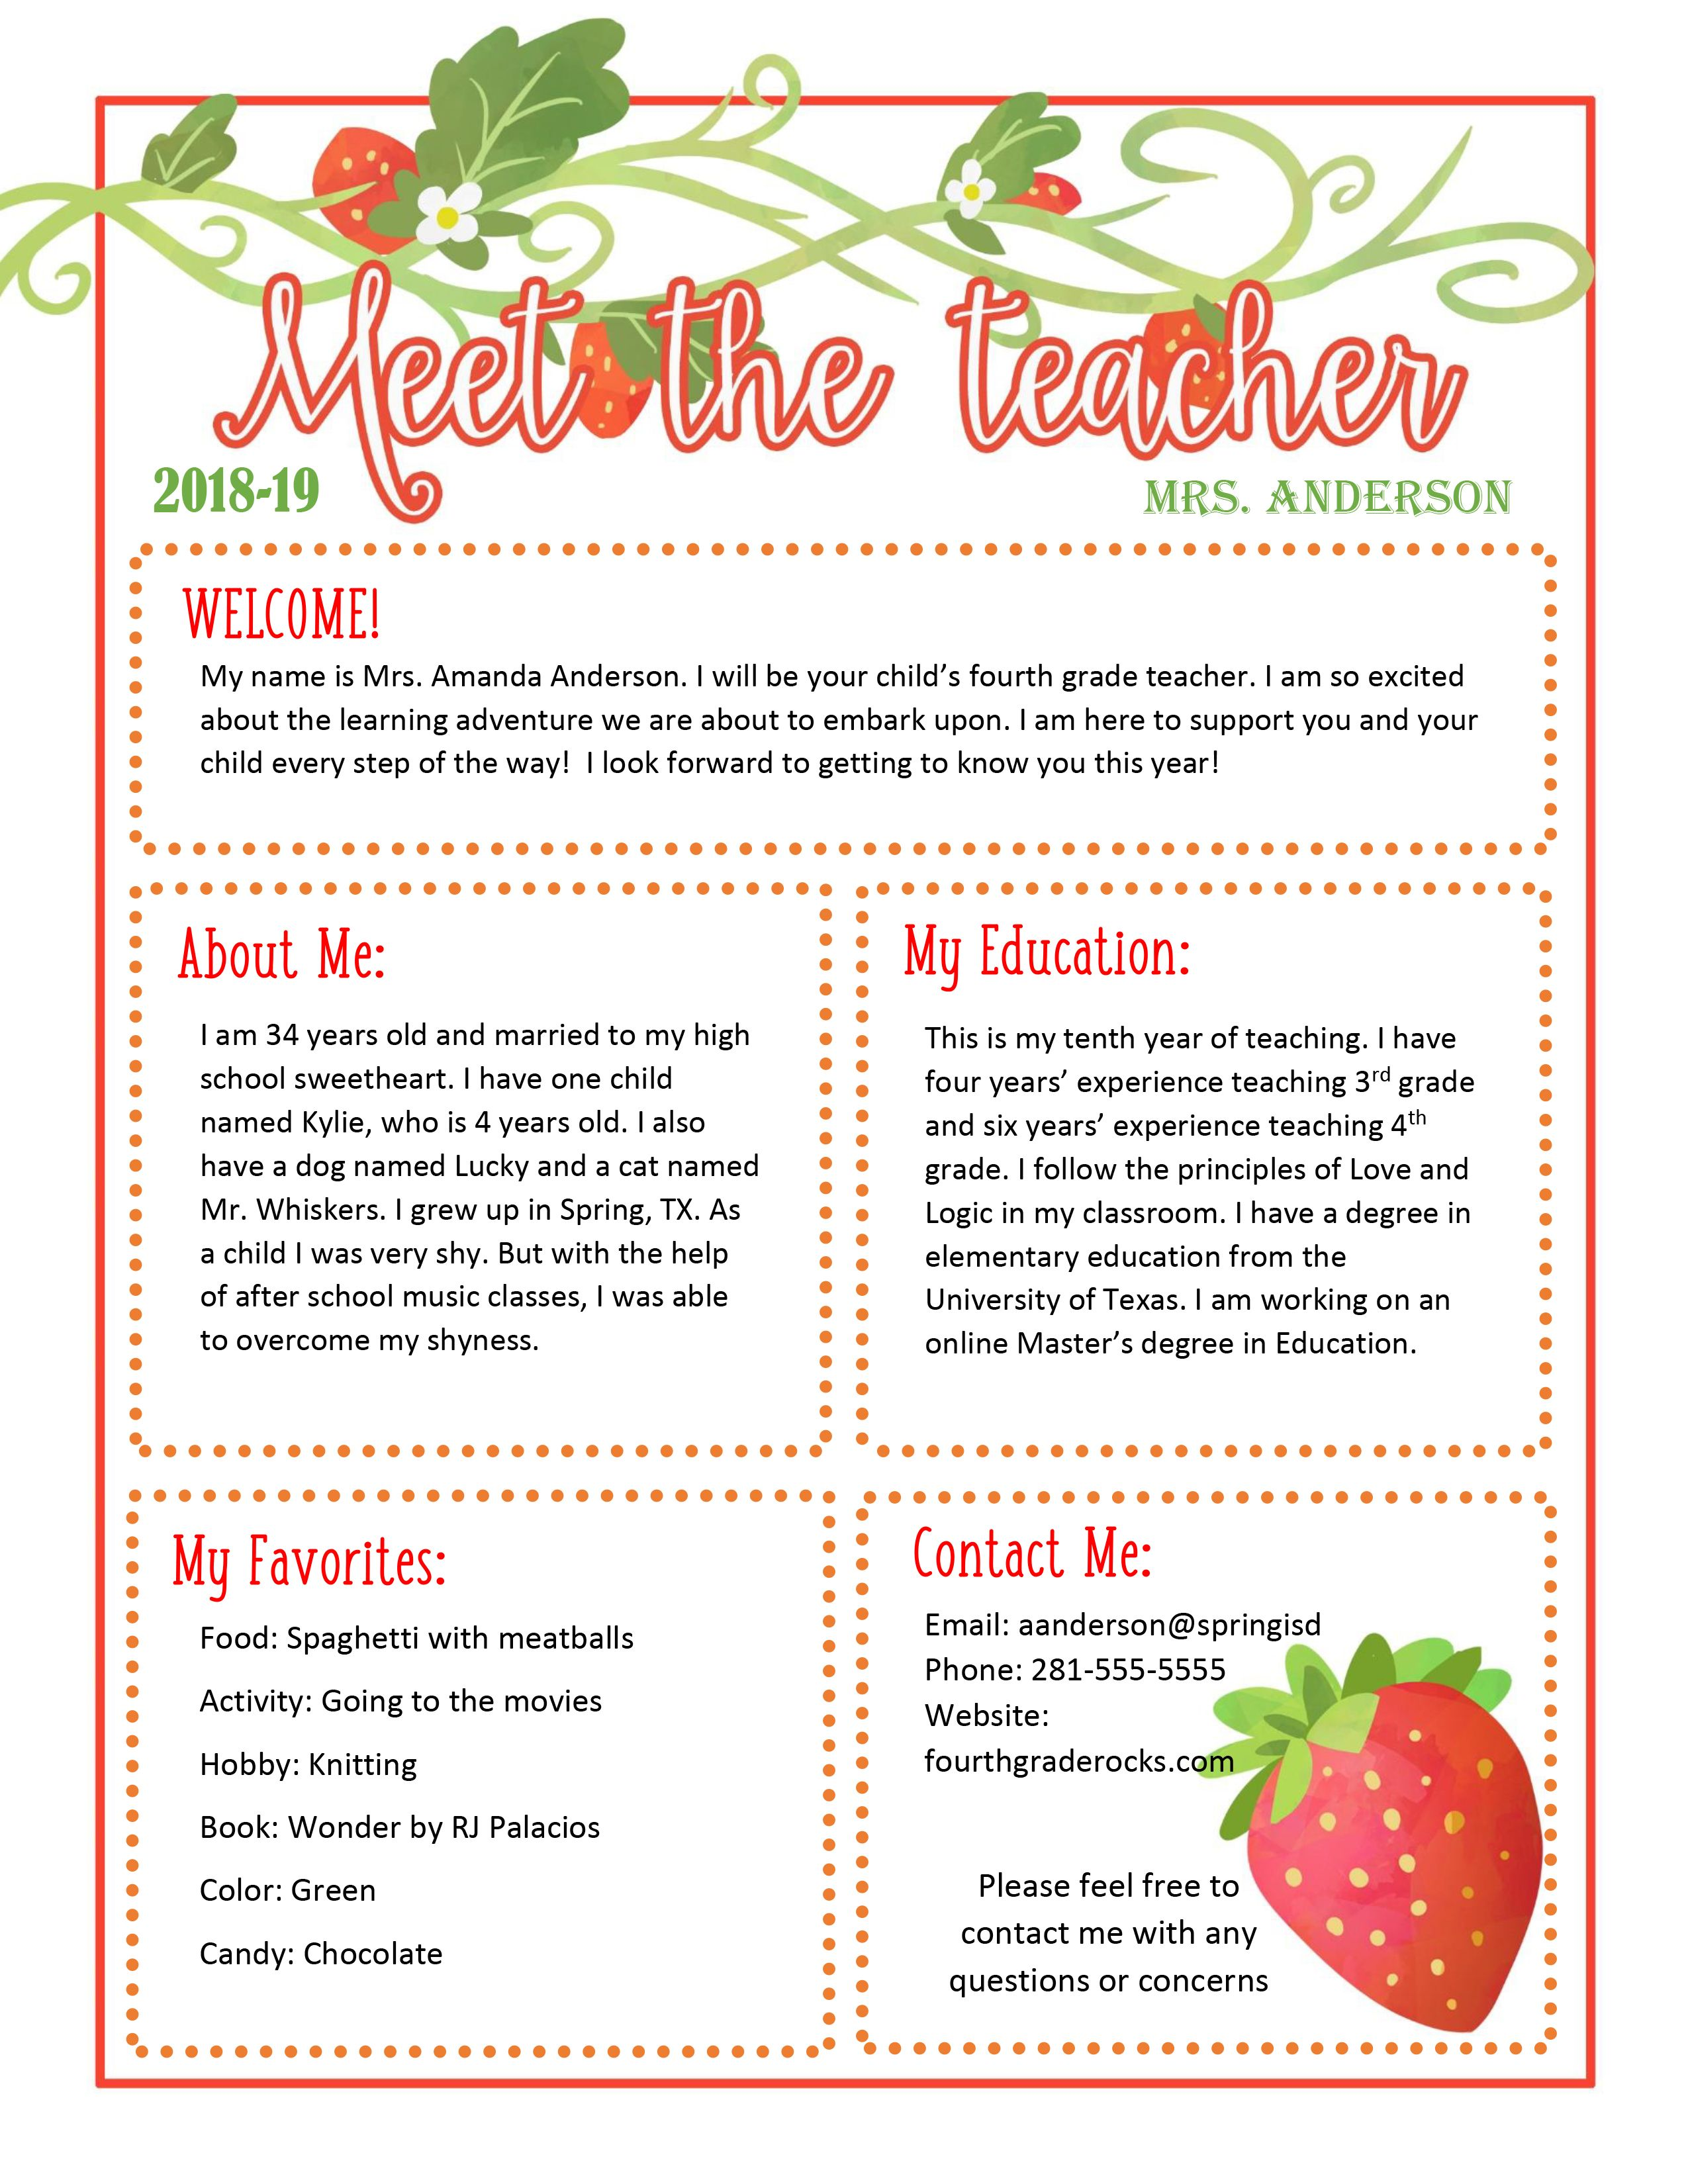 Meet The Teacher Strawberry Themed Newsletter Template Doc Is